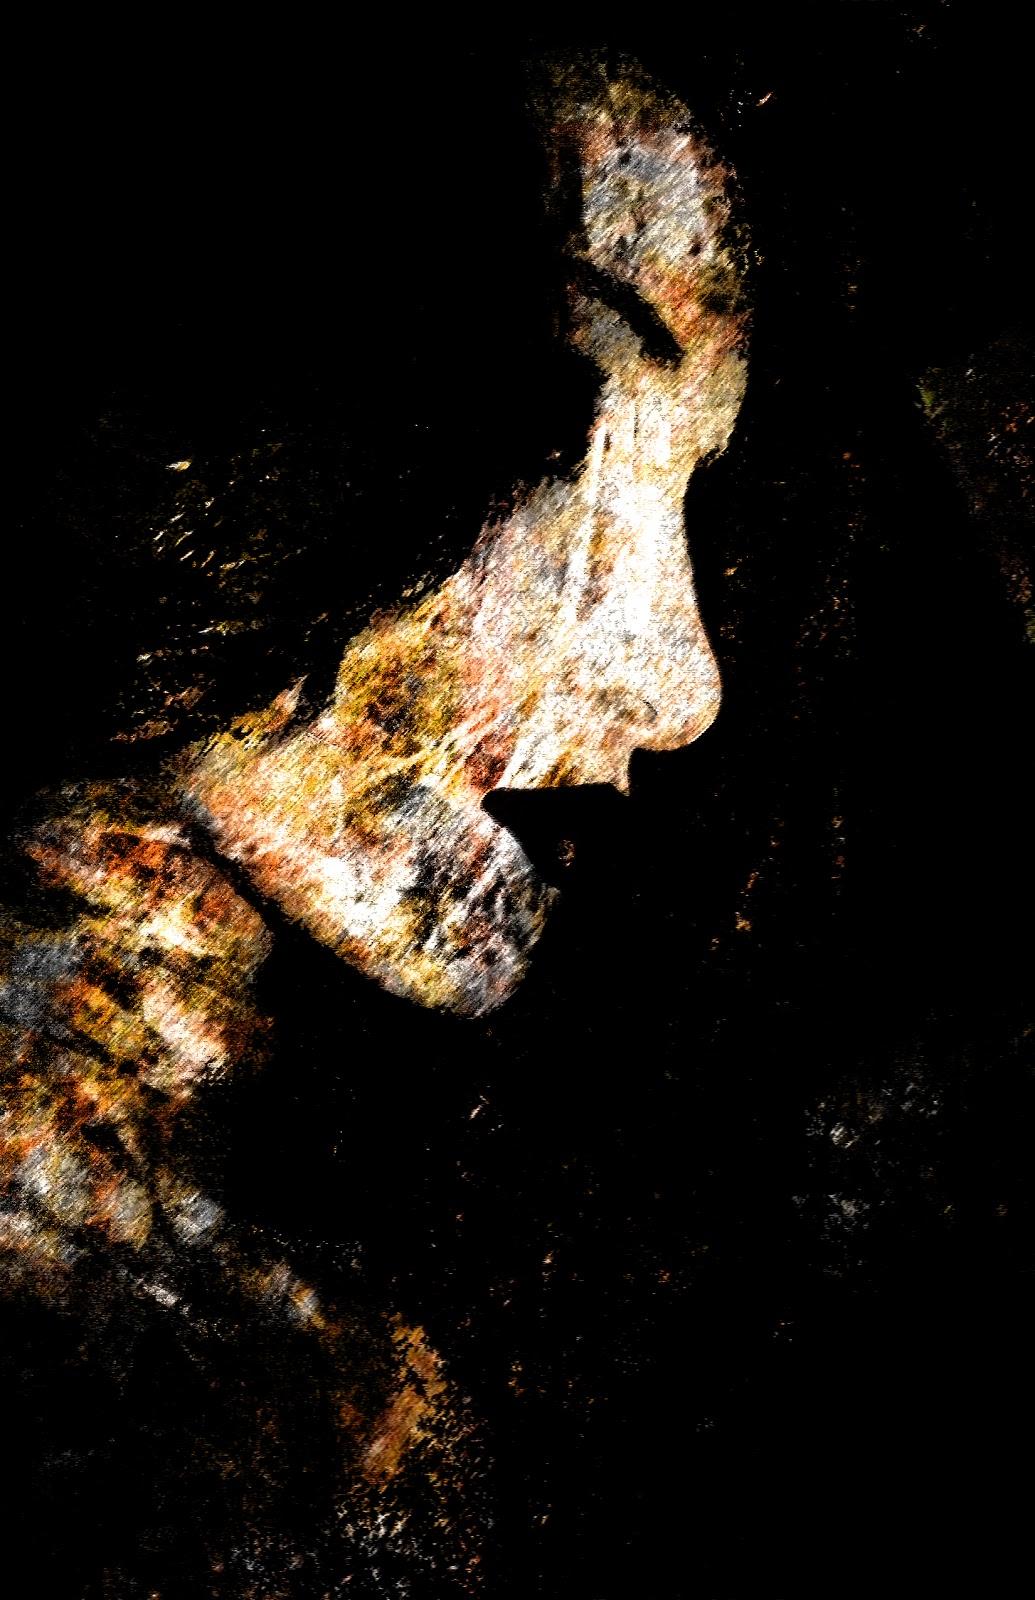 http://3.bp.blogspot.com/-8iOmdp5lJNA/UIA74KUBrEI/AAAAAAAAAWA/04bYkORForo/s1600/Scorned%2B%25252B%2BScared.jpg